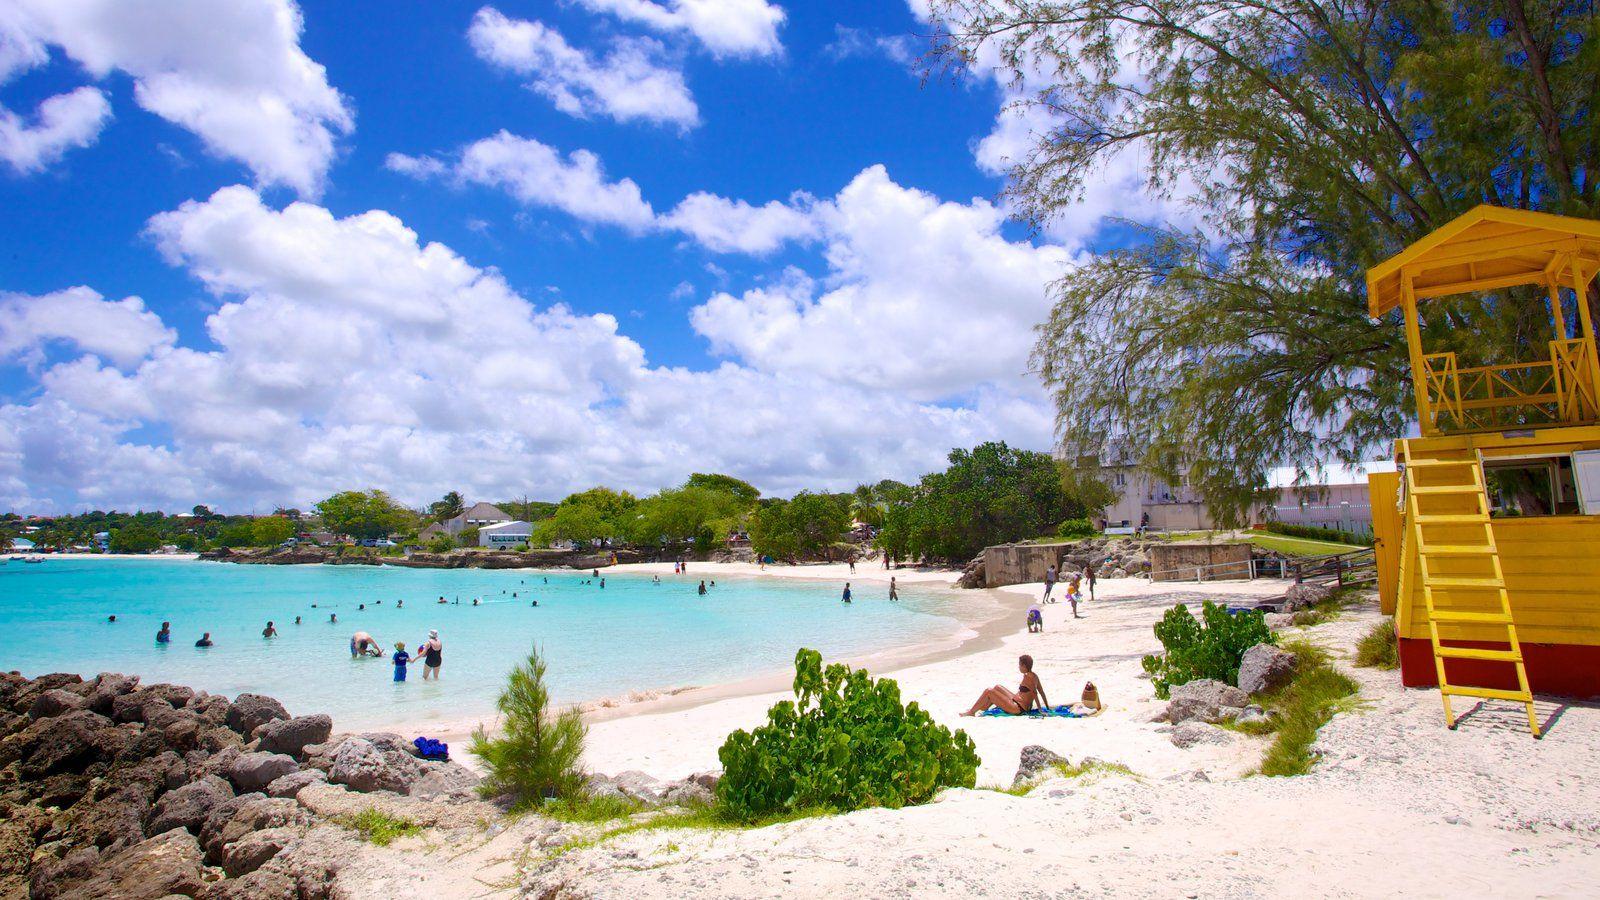 Martinique Travel Guide Barbados Beaches Miami Beach Stunning View